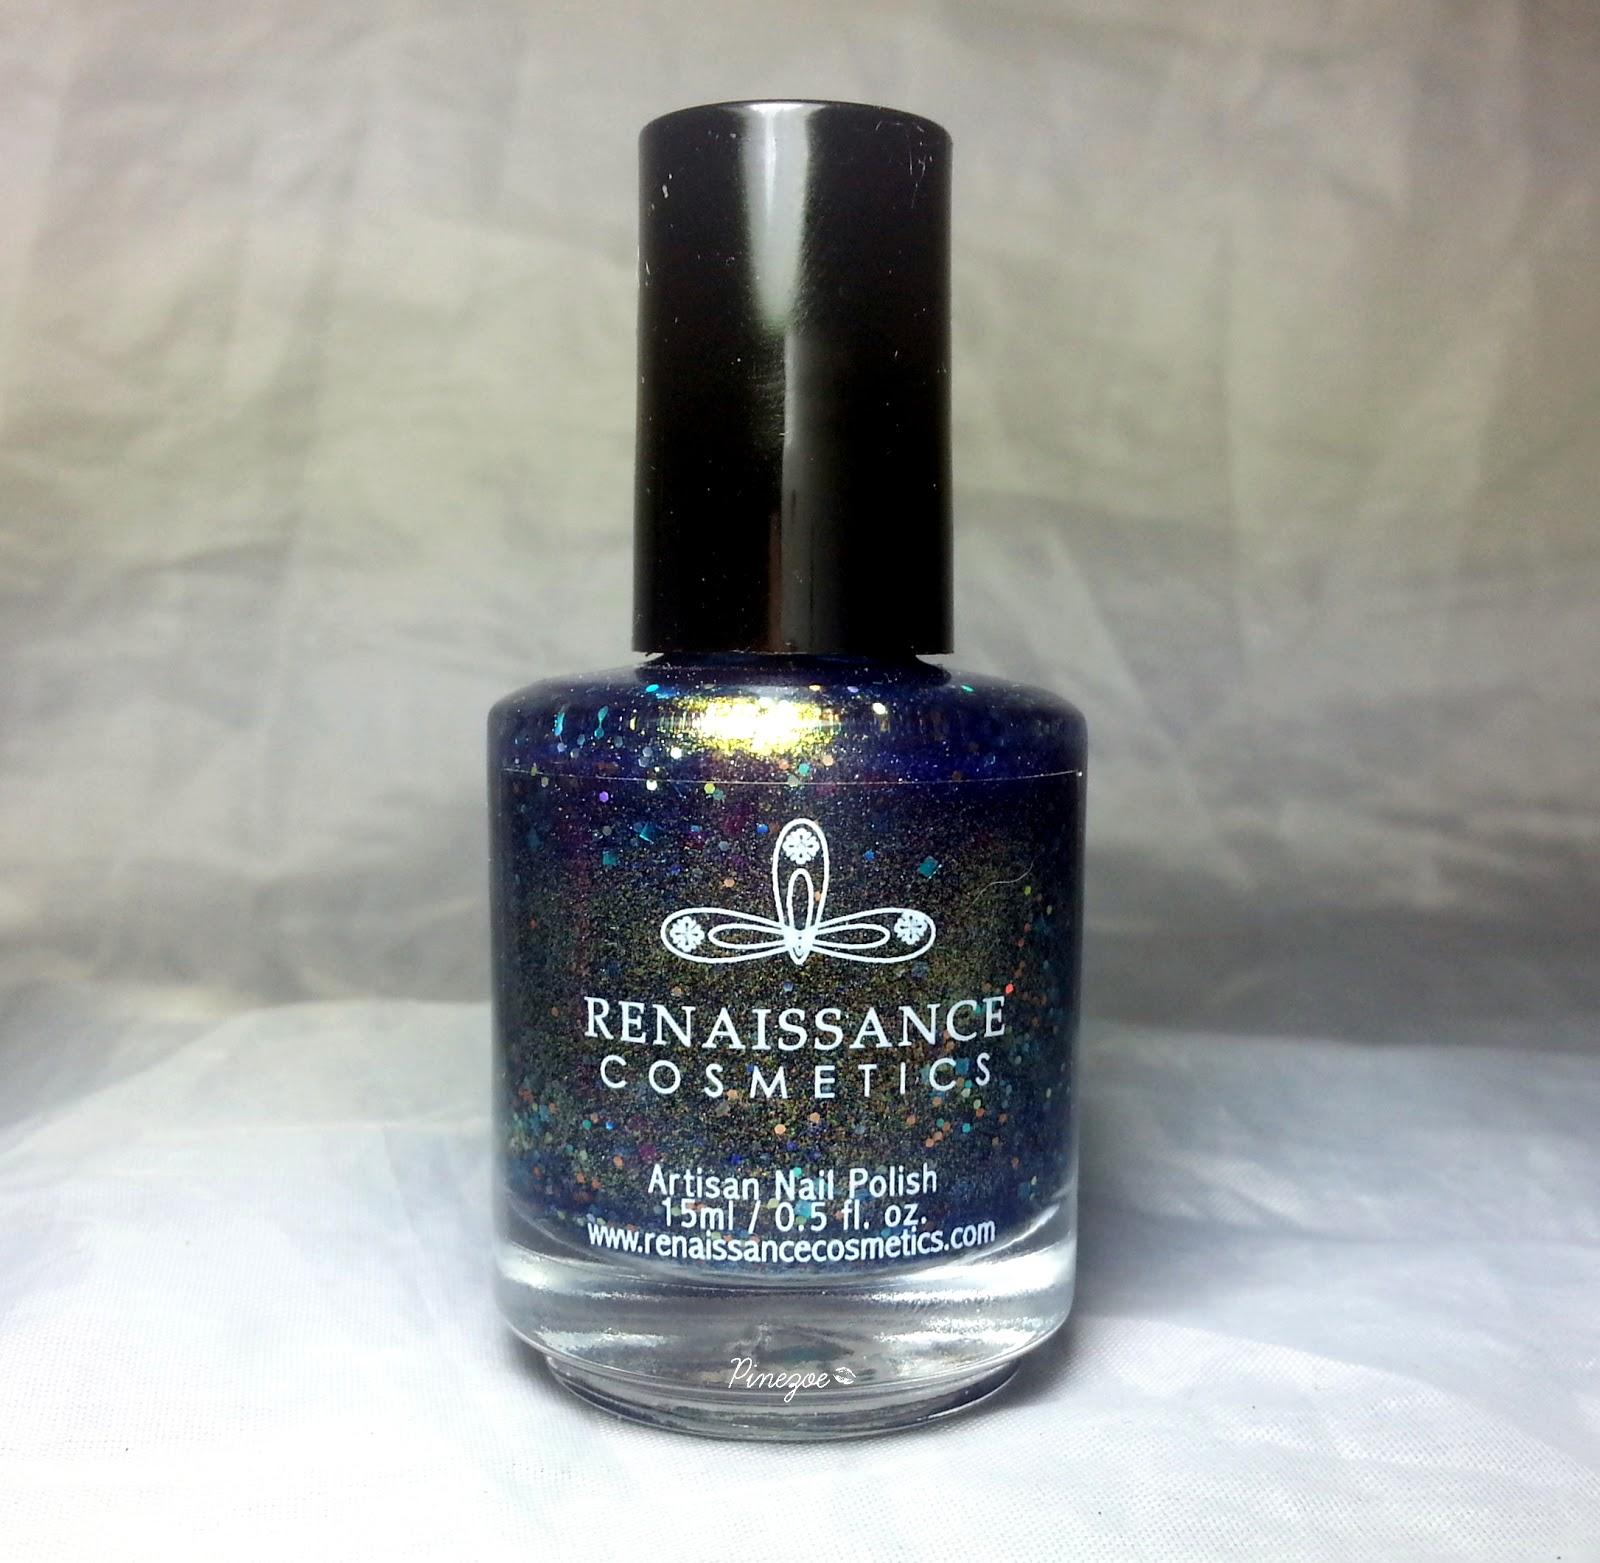 Renaissance Cosmetics - Nightshade